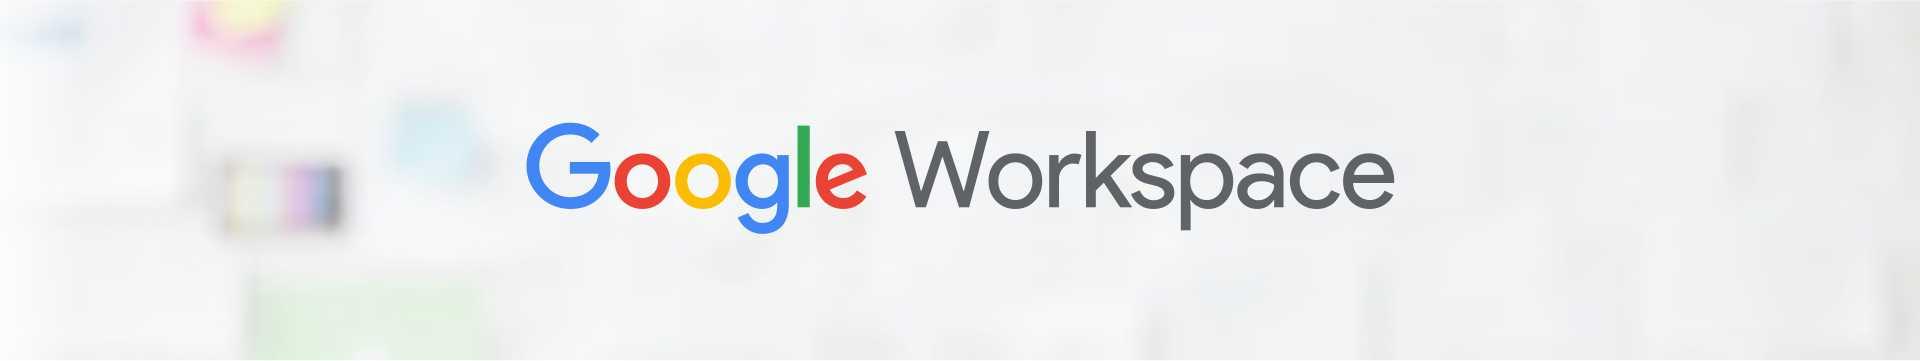 Google Workspace Perú